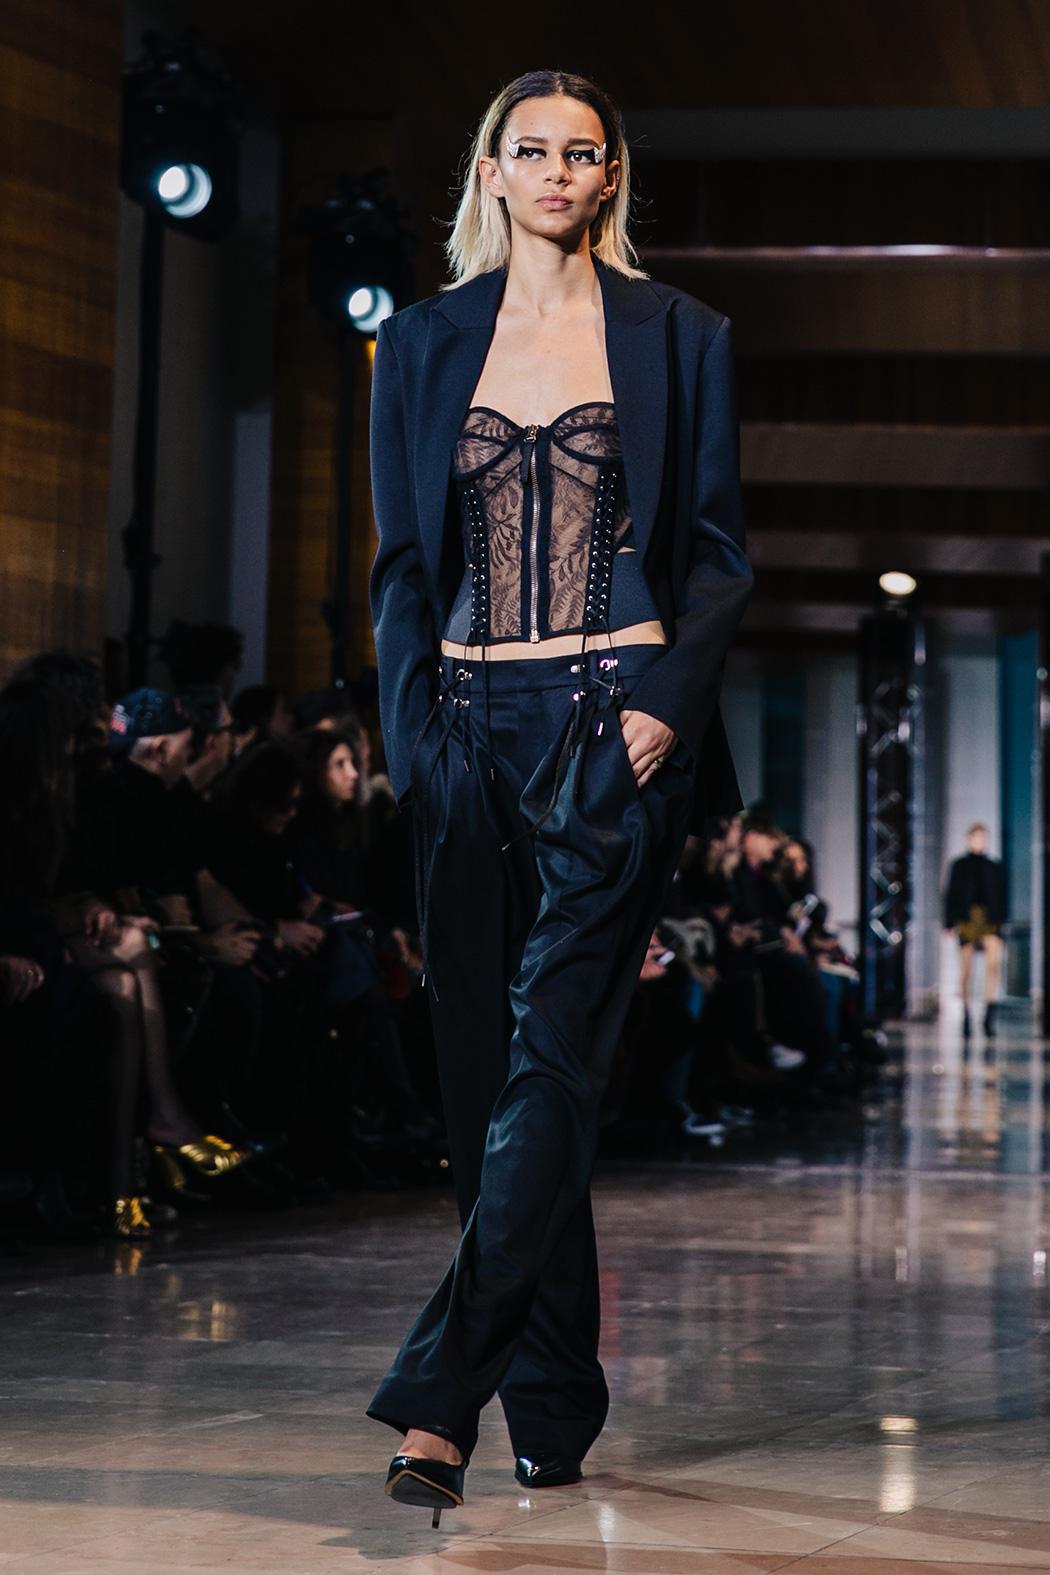 Paris_Fashion_Week-PFW-Anthony_Vaccarello_Fall_2016-Runway-10